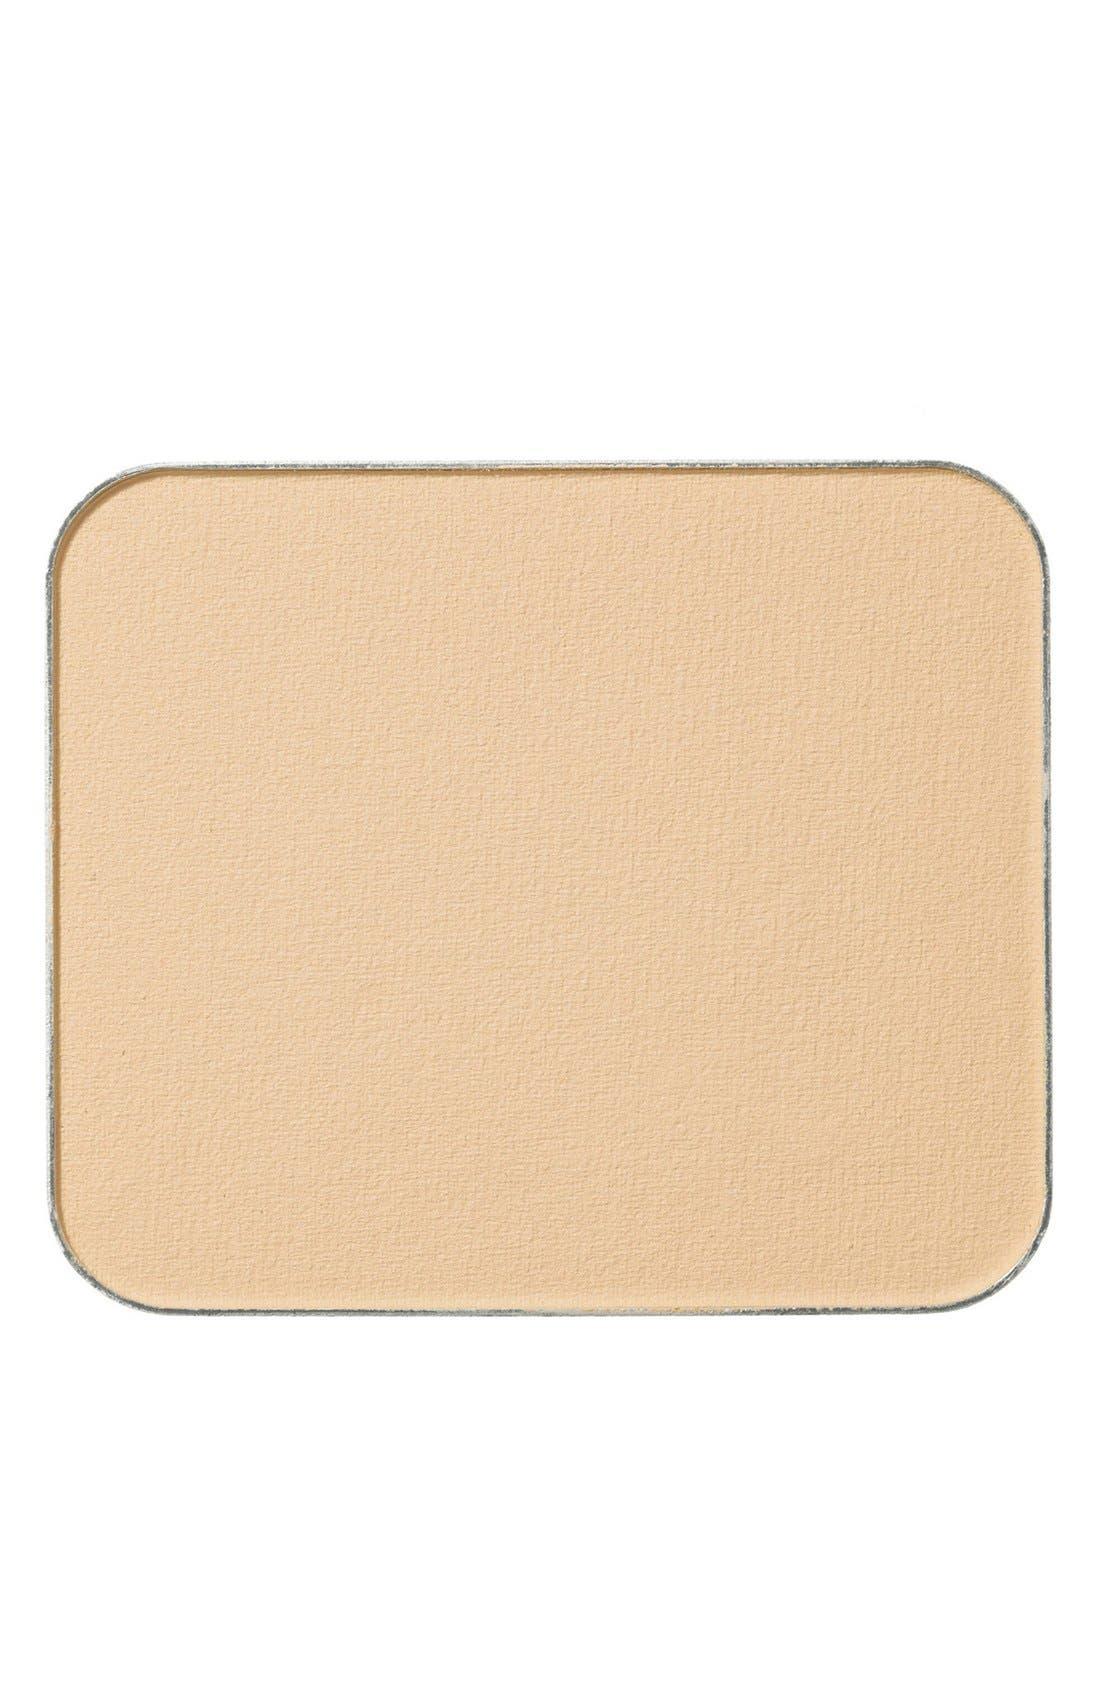 Maifanshi Silky Moisture Powder Compact Refill,                             Main thumbnail 1, color,                             255